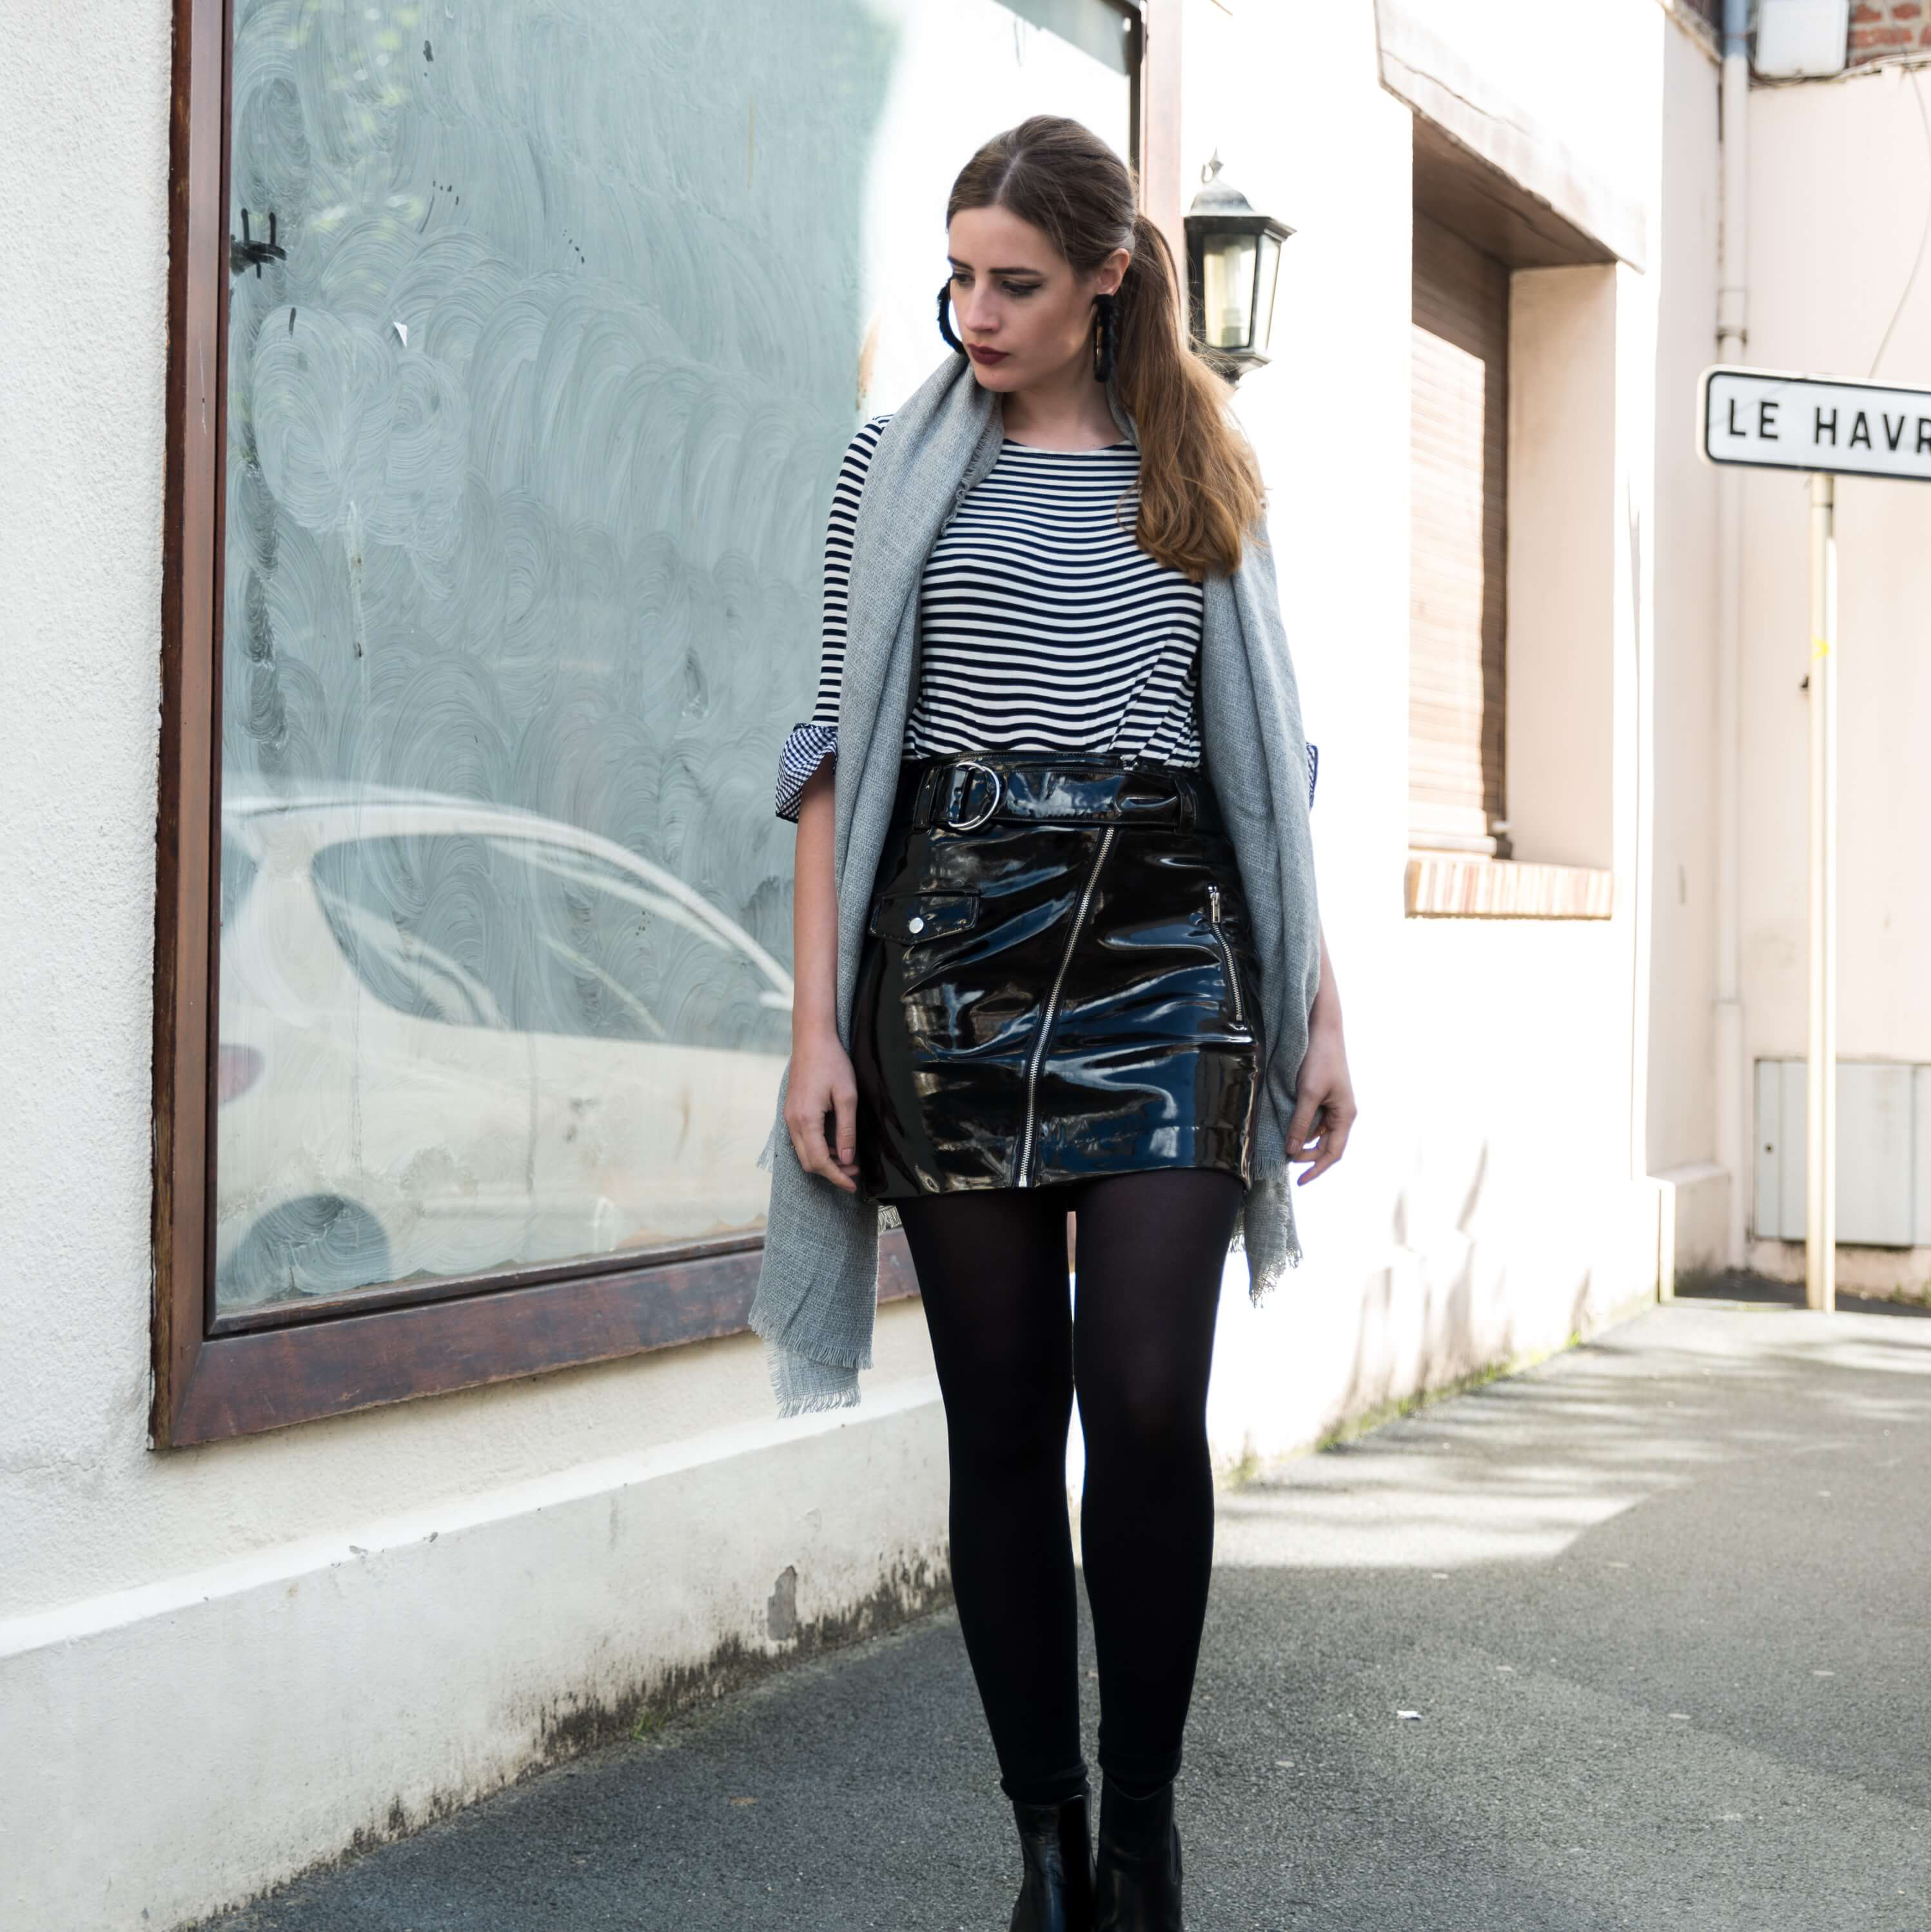 Street Style mit Vinyl-Modeblog-Fashionblogger Outfit